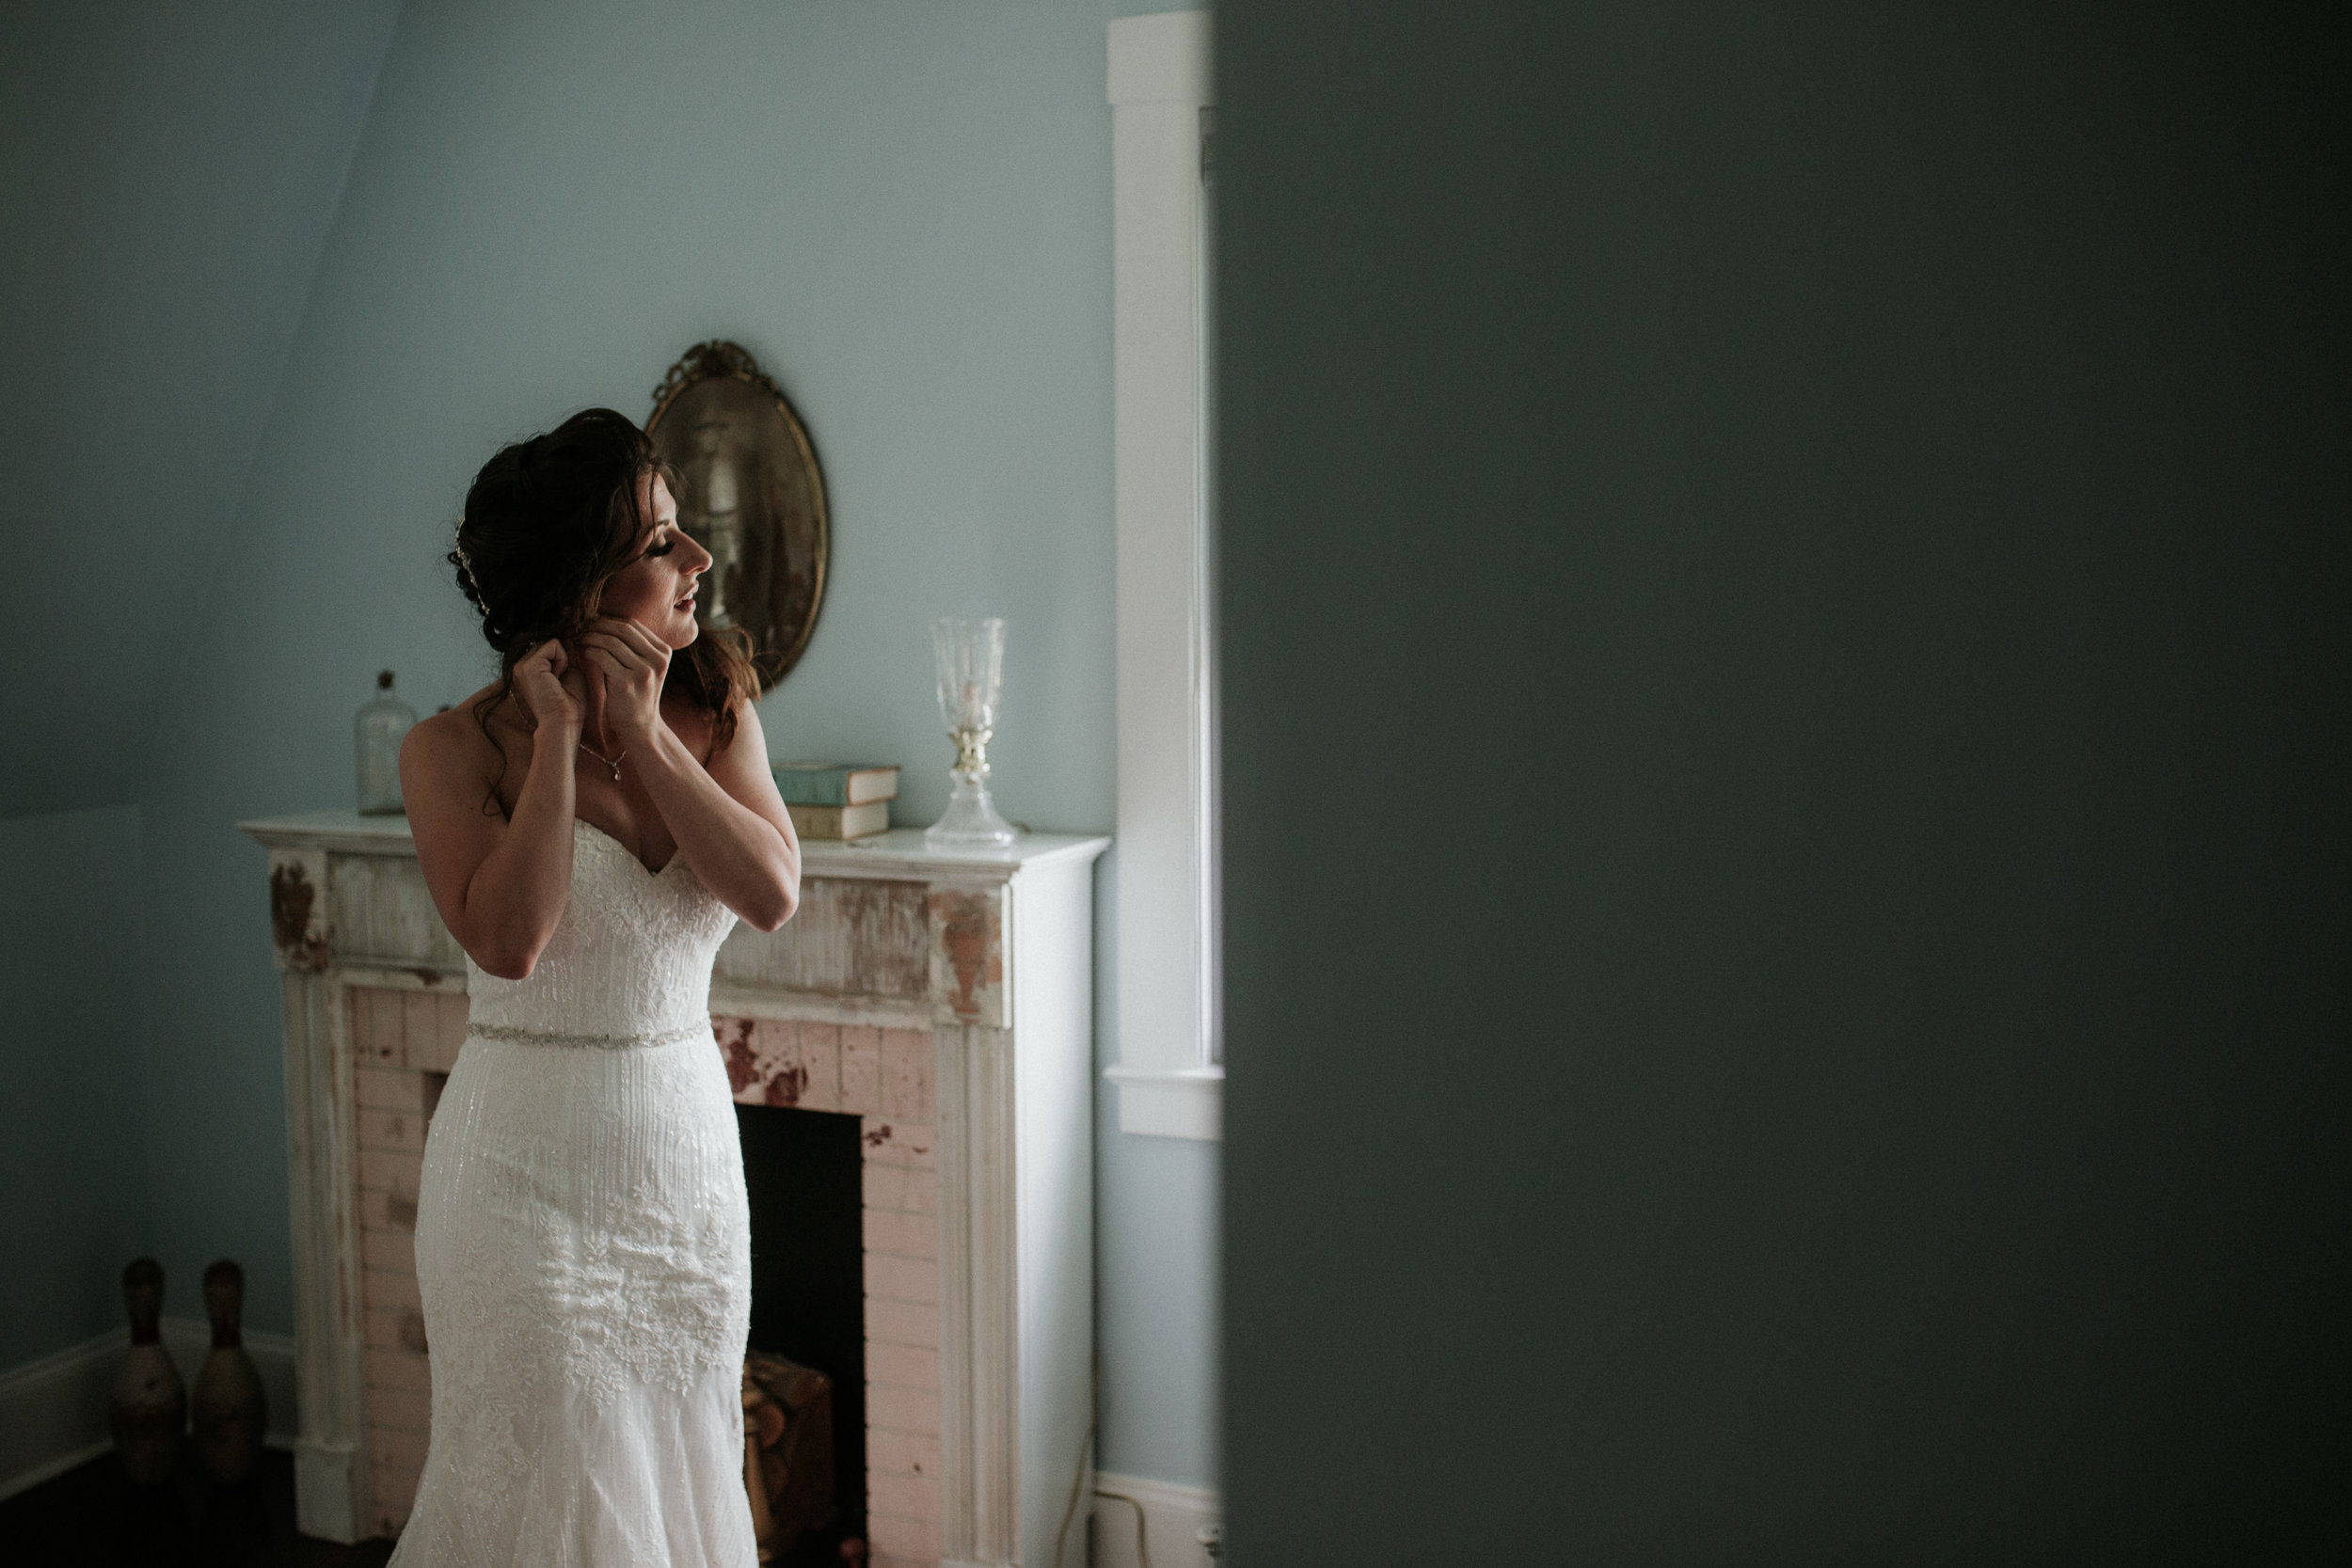 nostrano_vineyards_wedding_0019.JPG